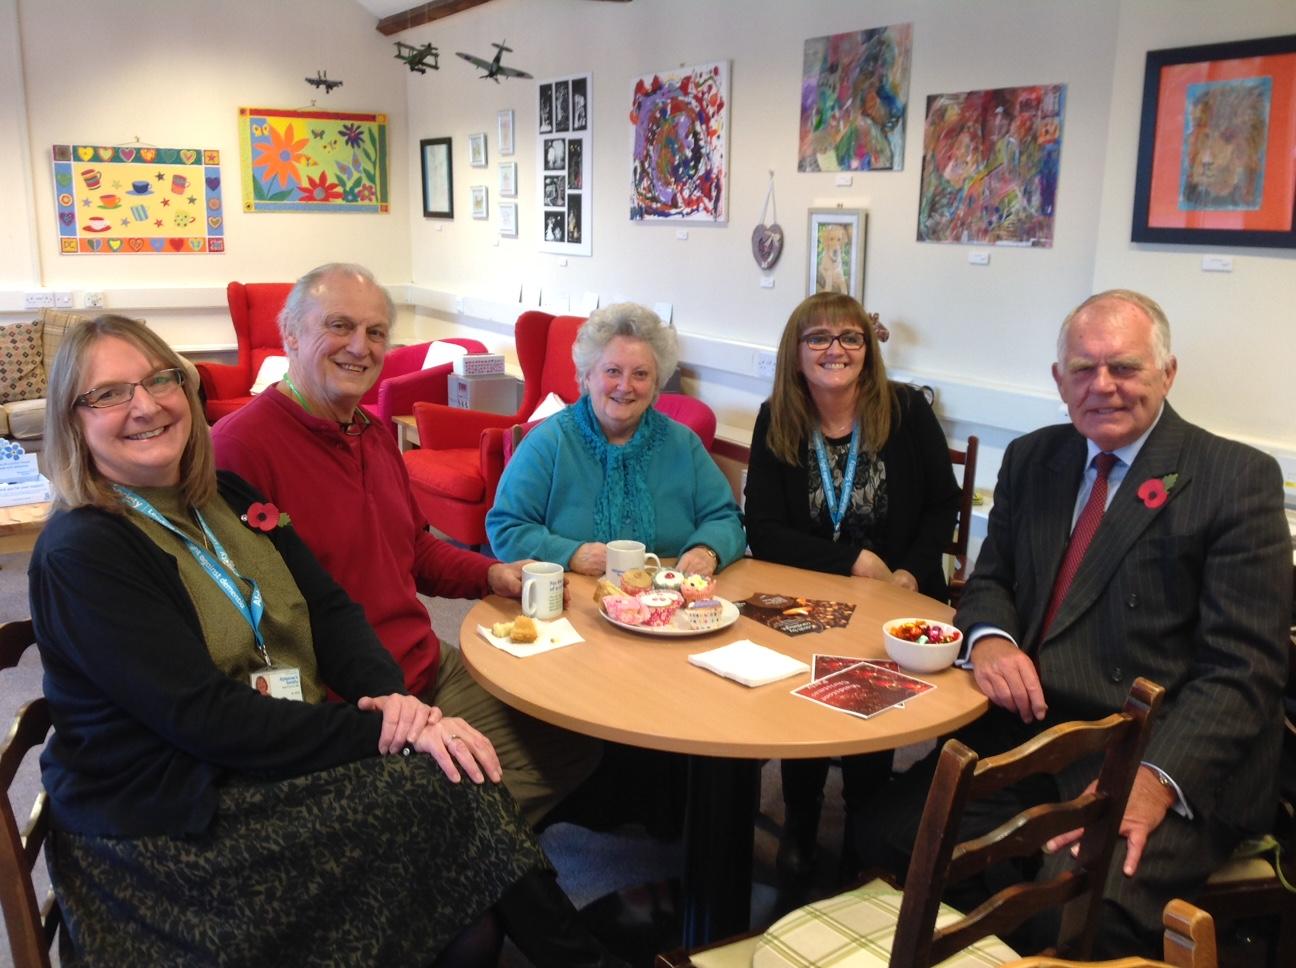 Bigger premises for the Alzheimer's Society in Maidstone